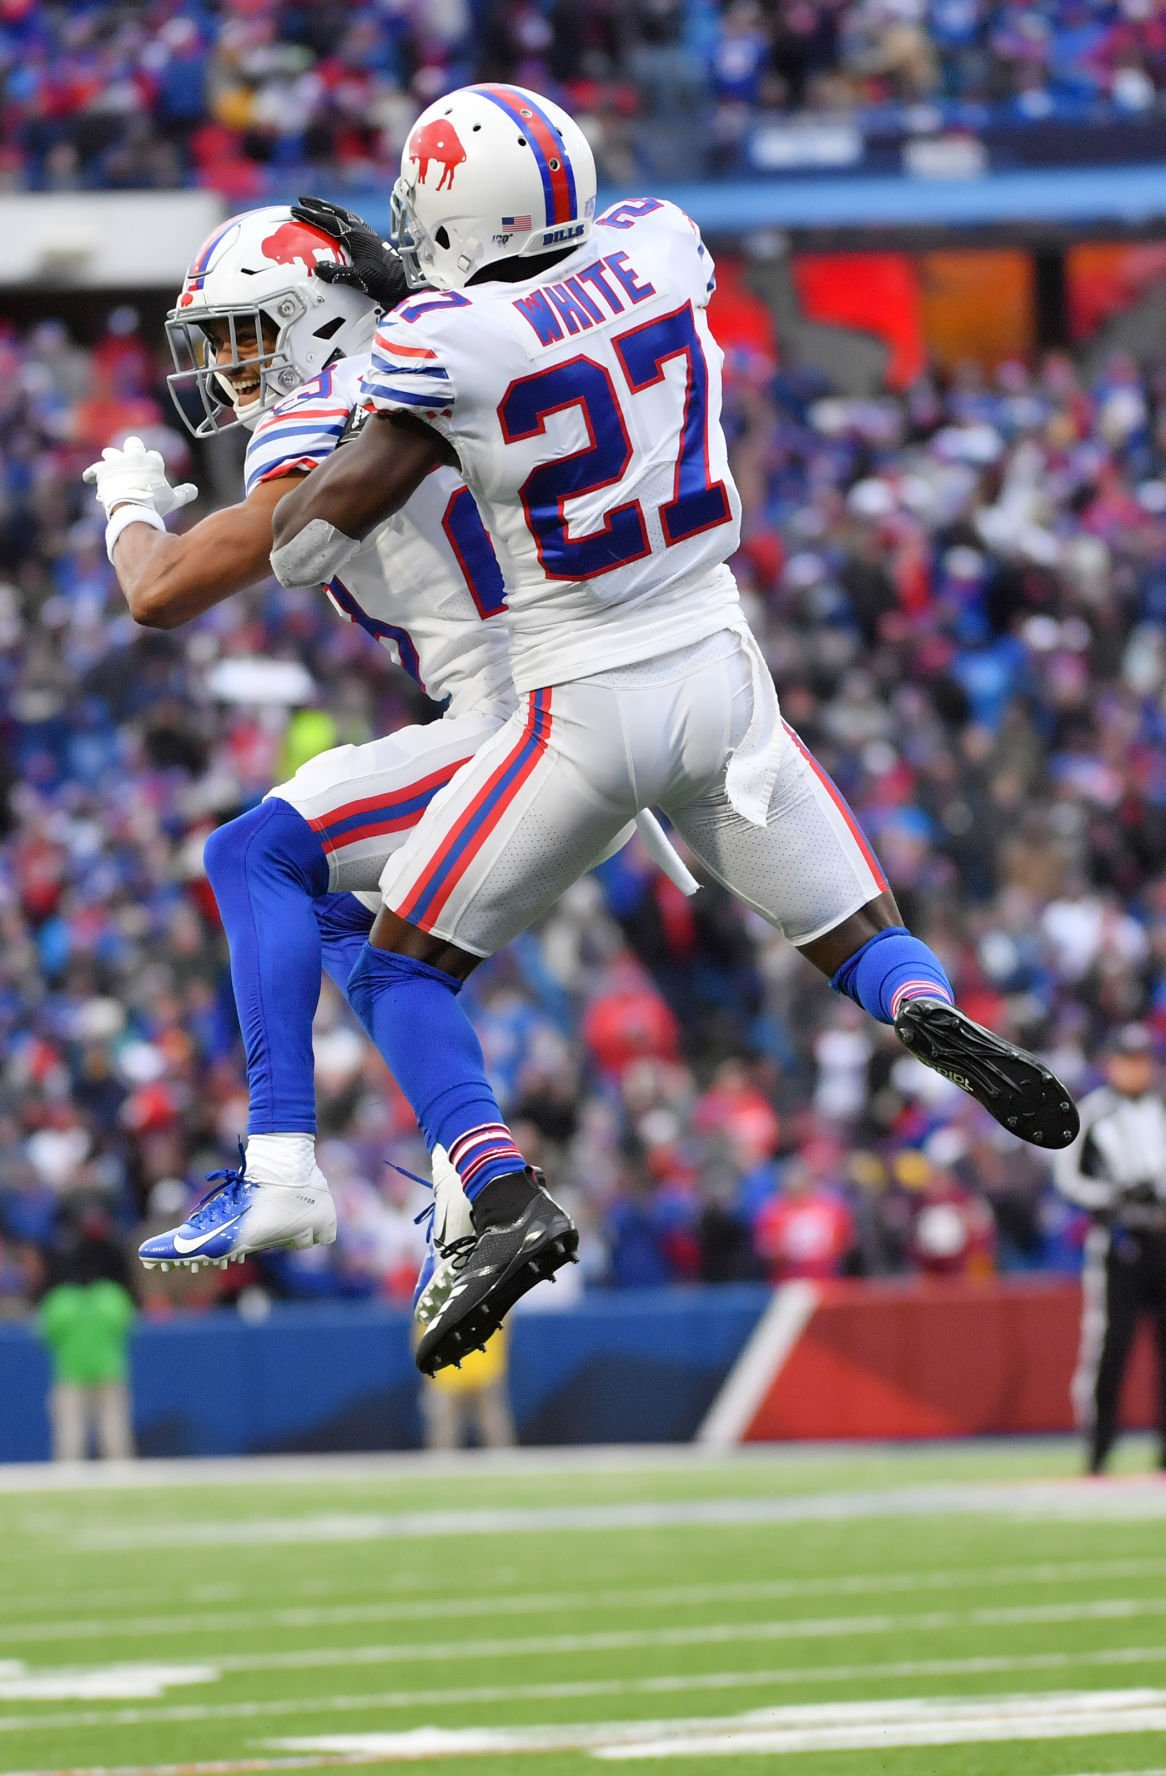 Bills improve to 6-2, off to best start since 1993